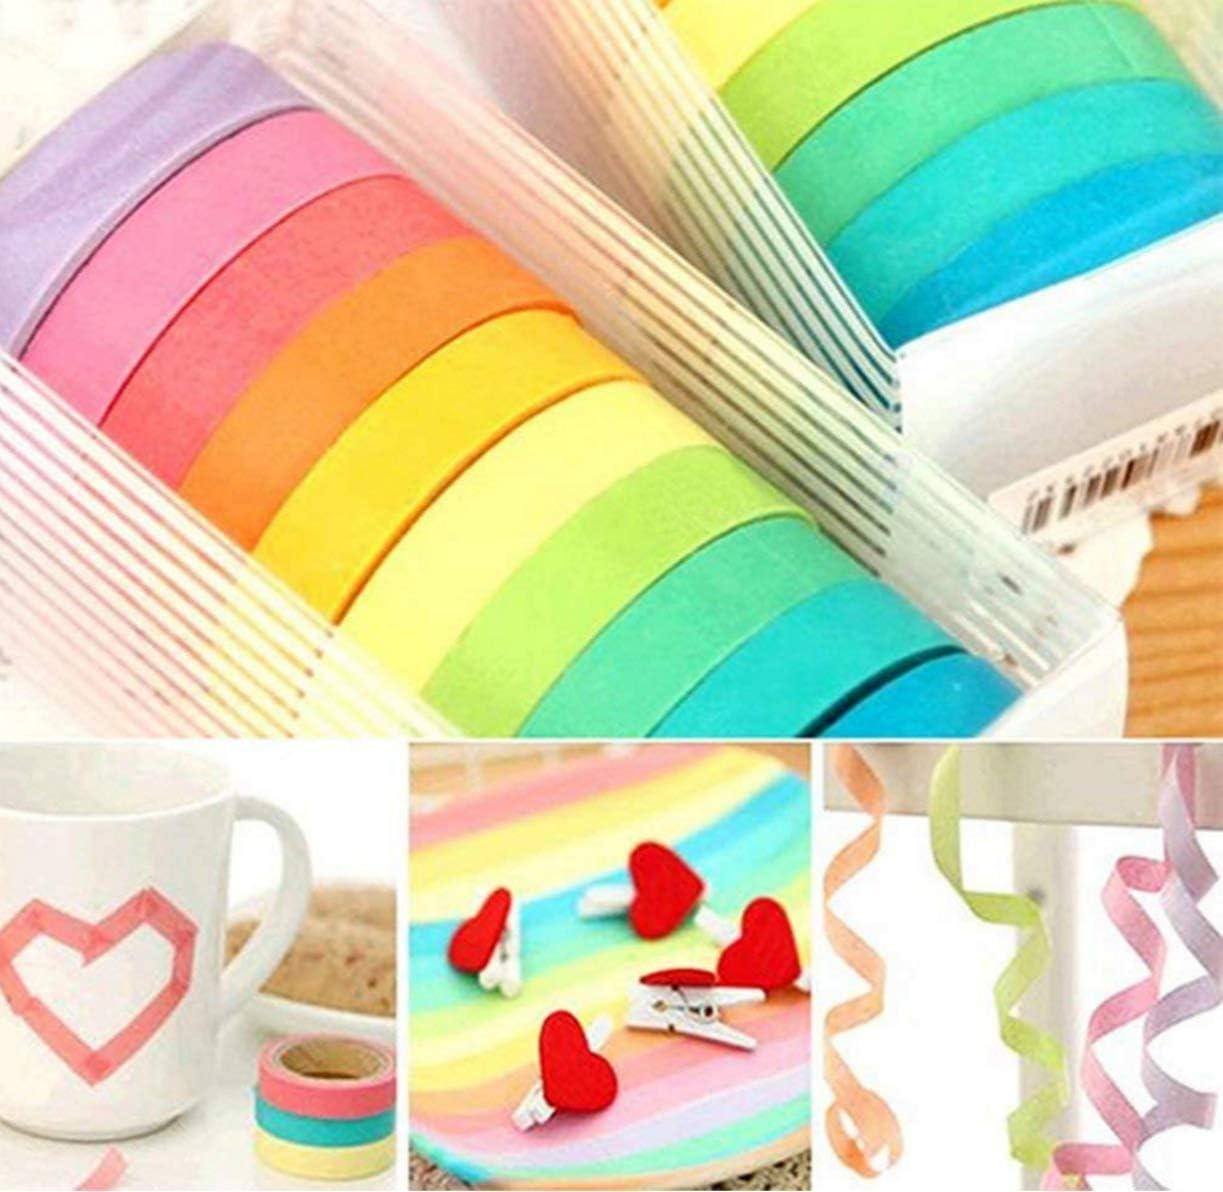 Westeng 5 x decorativo de papel japon/és Tape arco iris Rollos de papel para Manualidades DIY